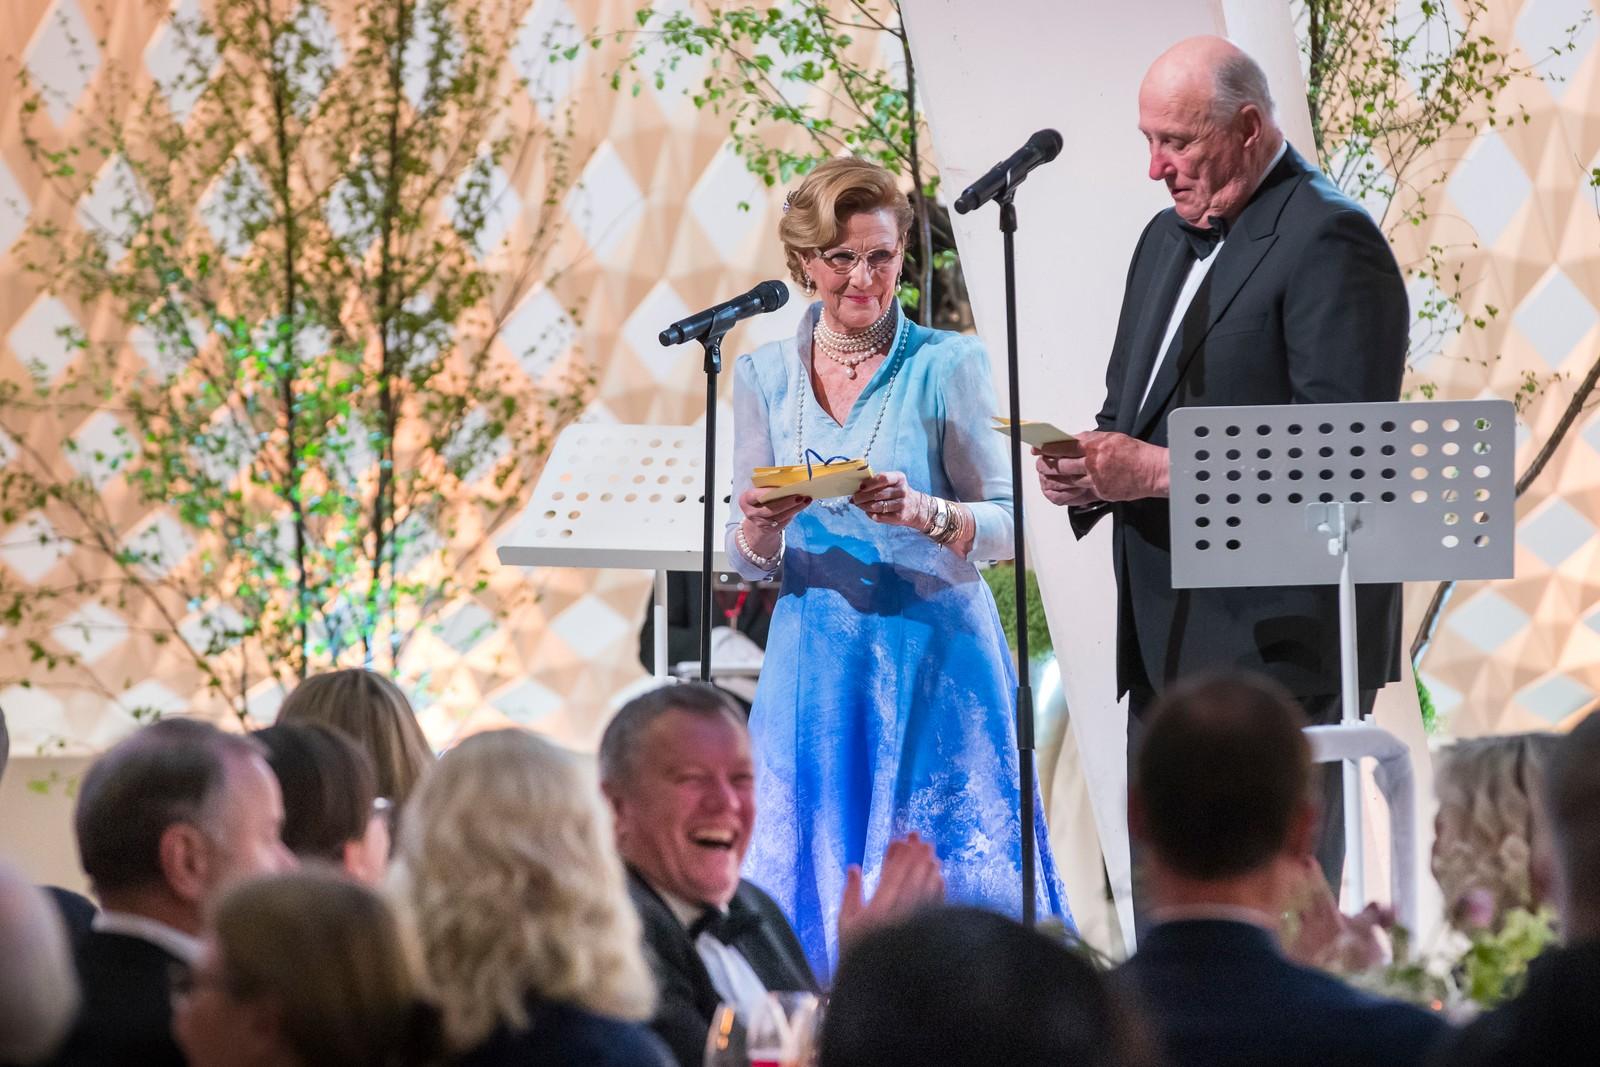 Dronning Sonja og kong Harald taler under regjeringens festmiddag for kongeparet i Operaen i anledning deres 80-årsfeiring.